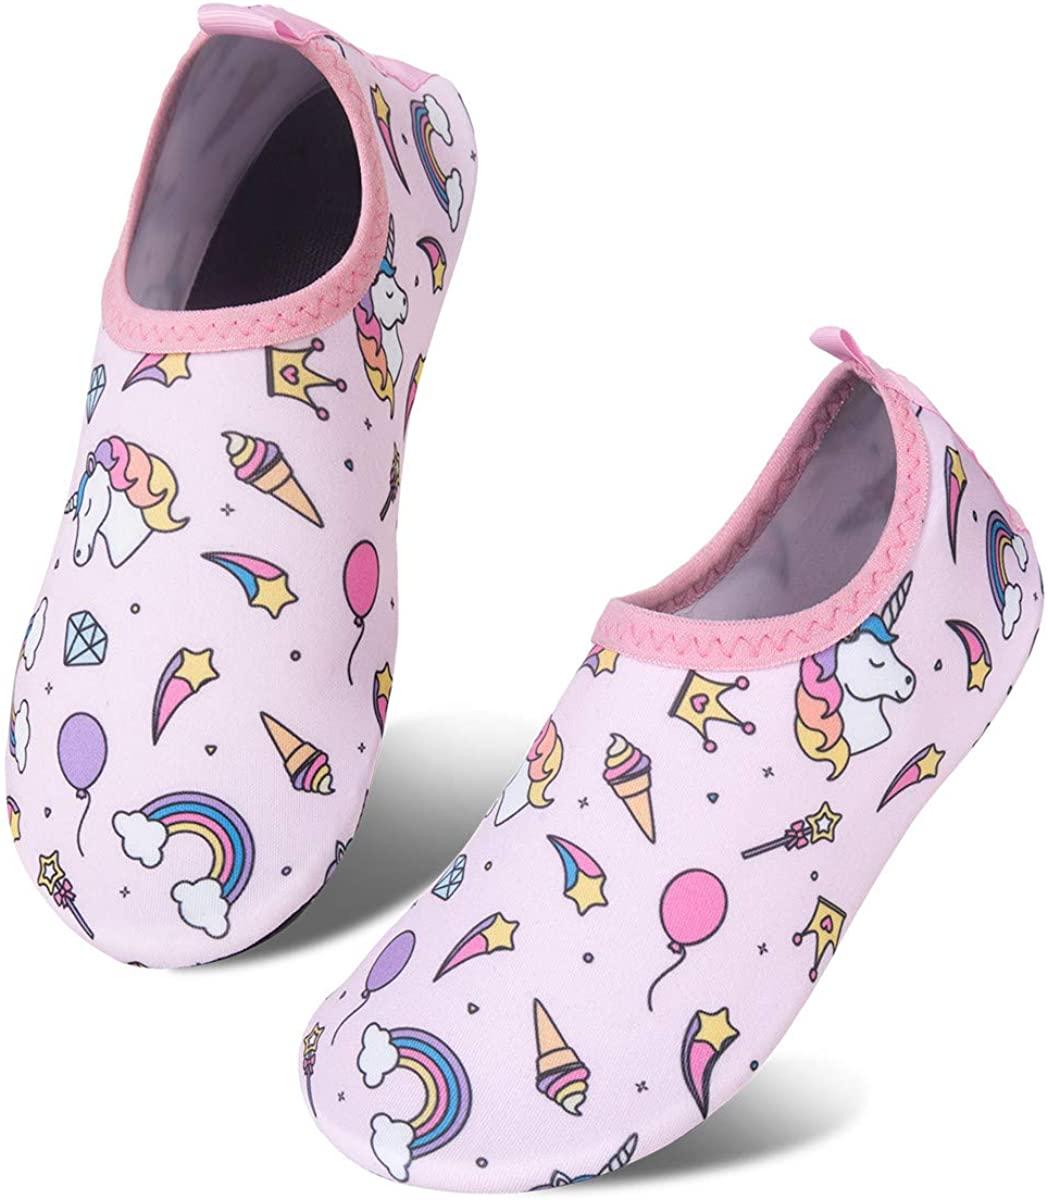 Kids Water Swim Shoes Barefoot Aqua Socks Shoes Quick Dry Non-Slip Baby Boys & Girls (Unicorn/Ice Cream